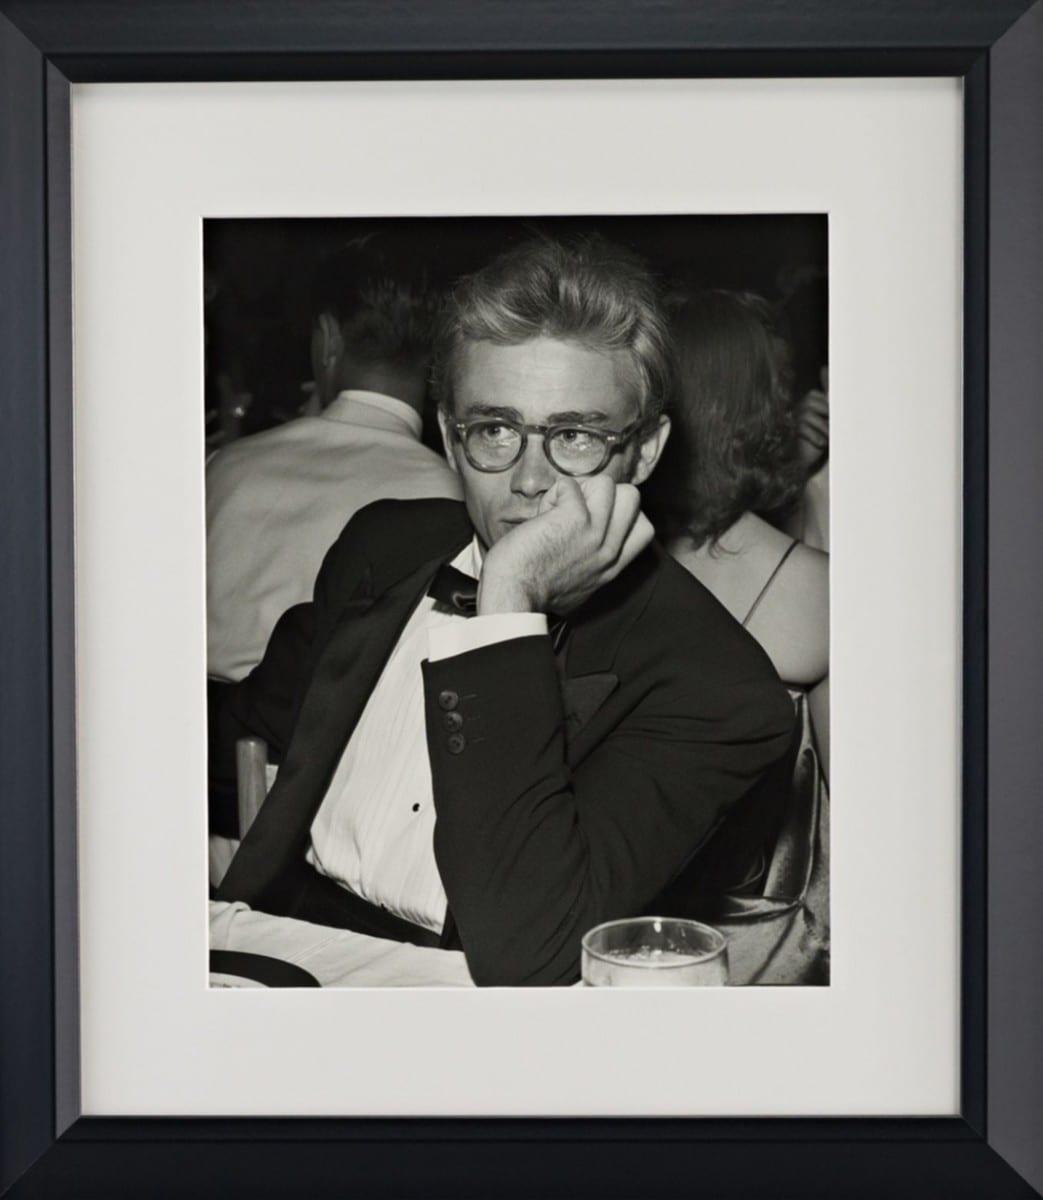 Michael Ochs, James Dean, gelatin silver print on archival fiber paper, 1955 ©Ralph Lauren Home and Getty Images